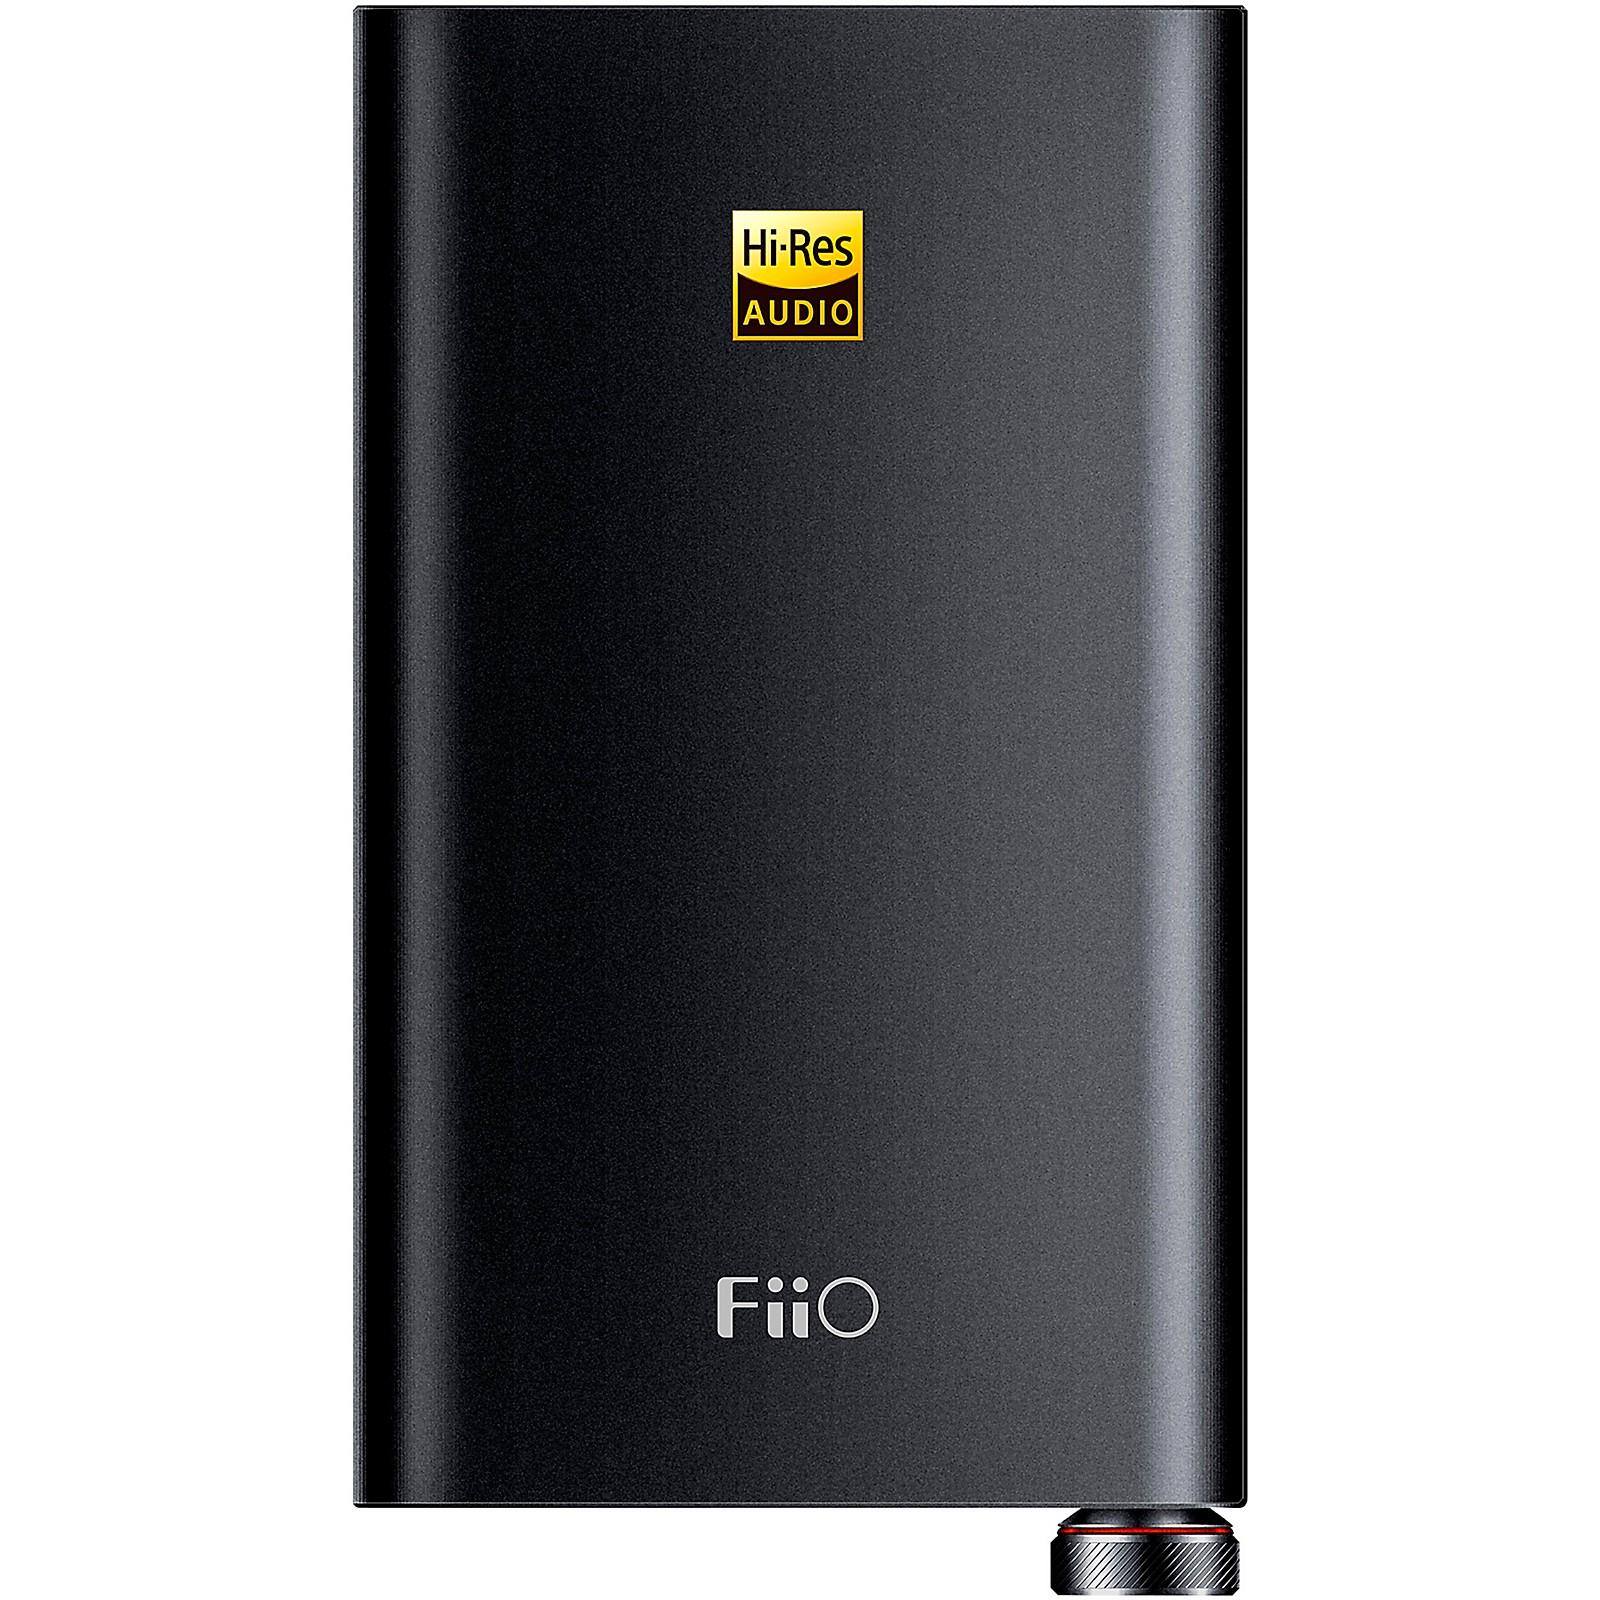 FiiO Q1-II Portable USB DAC and Headphone Amp—Native DSD DAC/Amp for iPhone